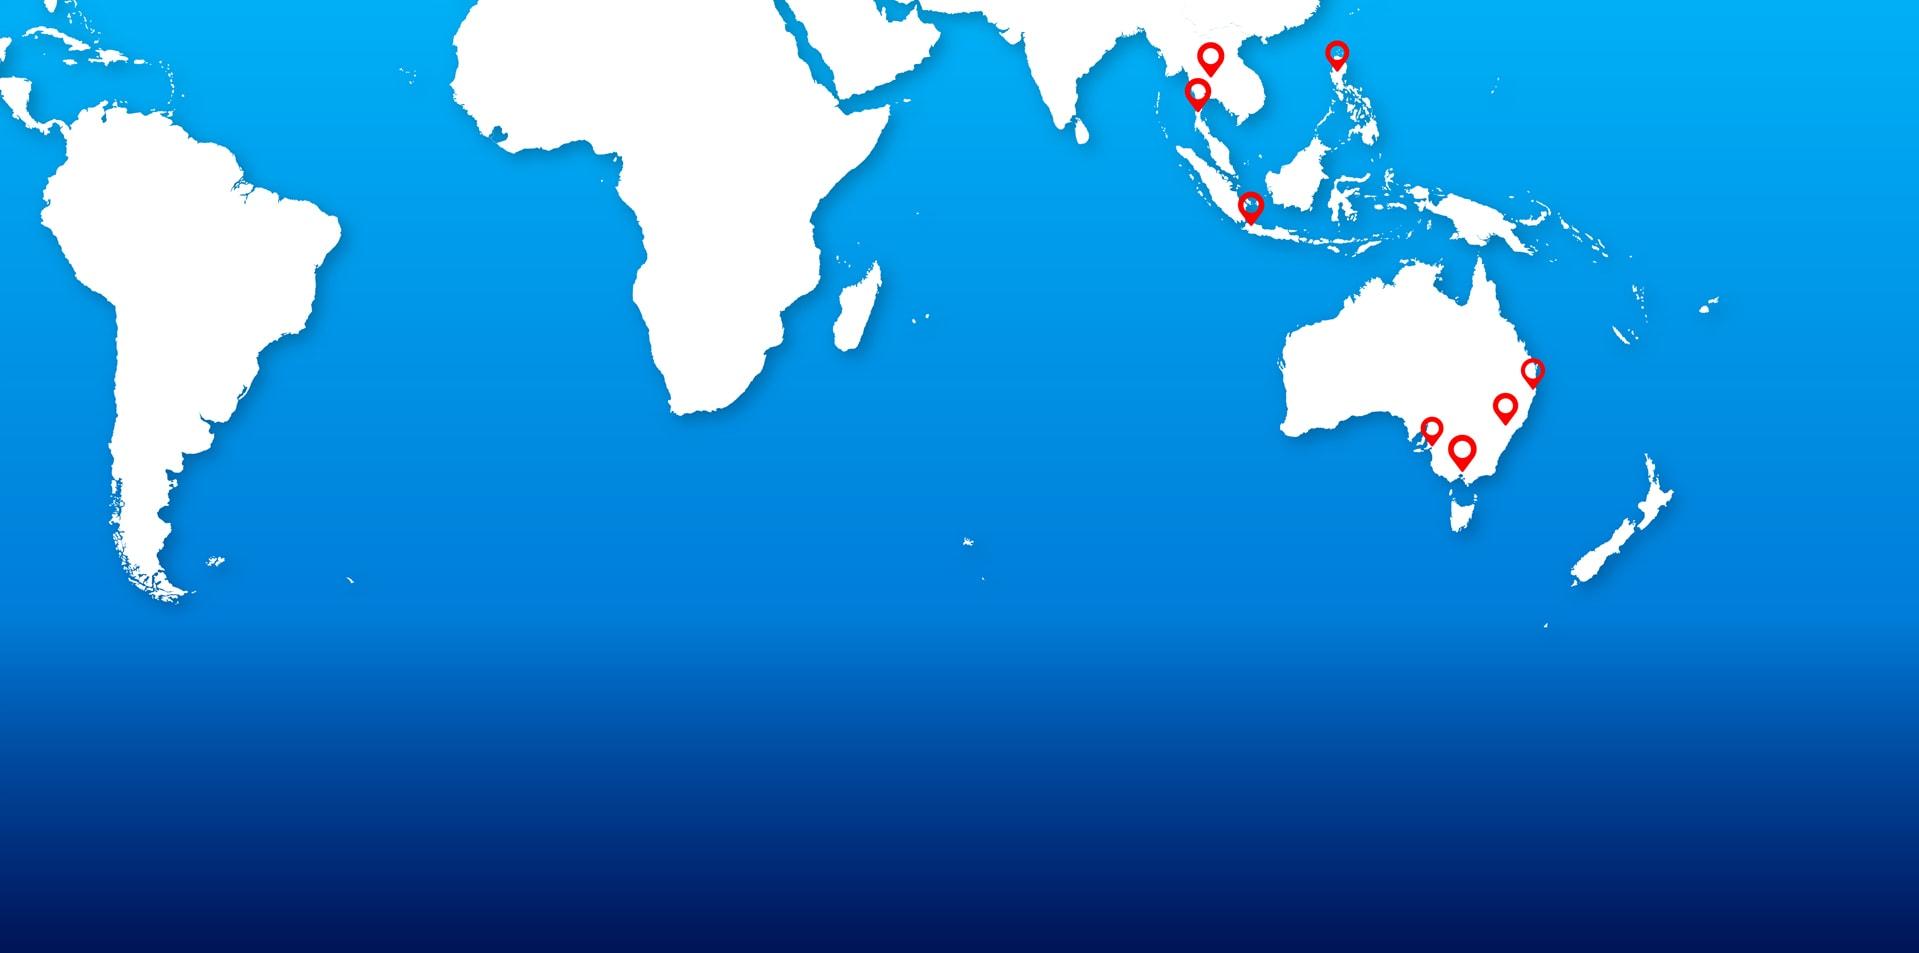 Hilco APAC locations - Asia Pacific Region